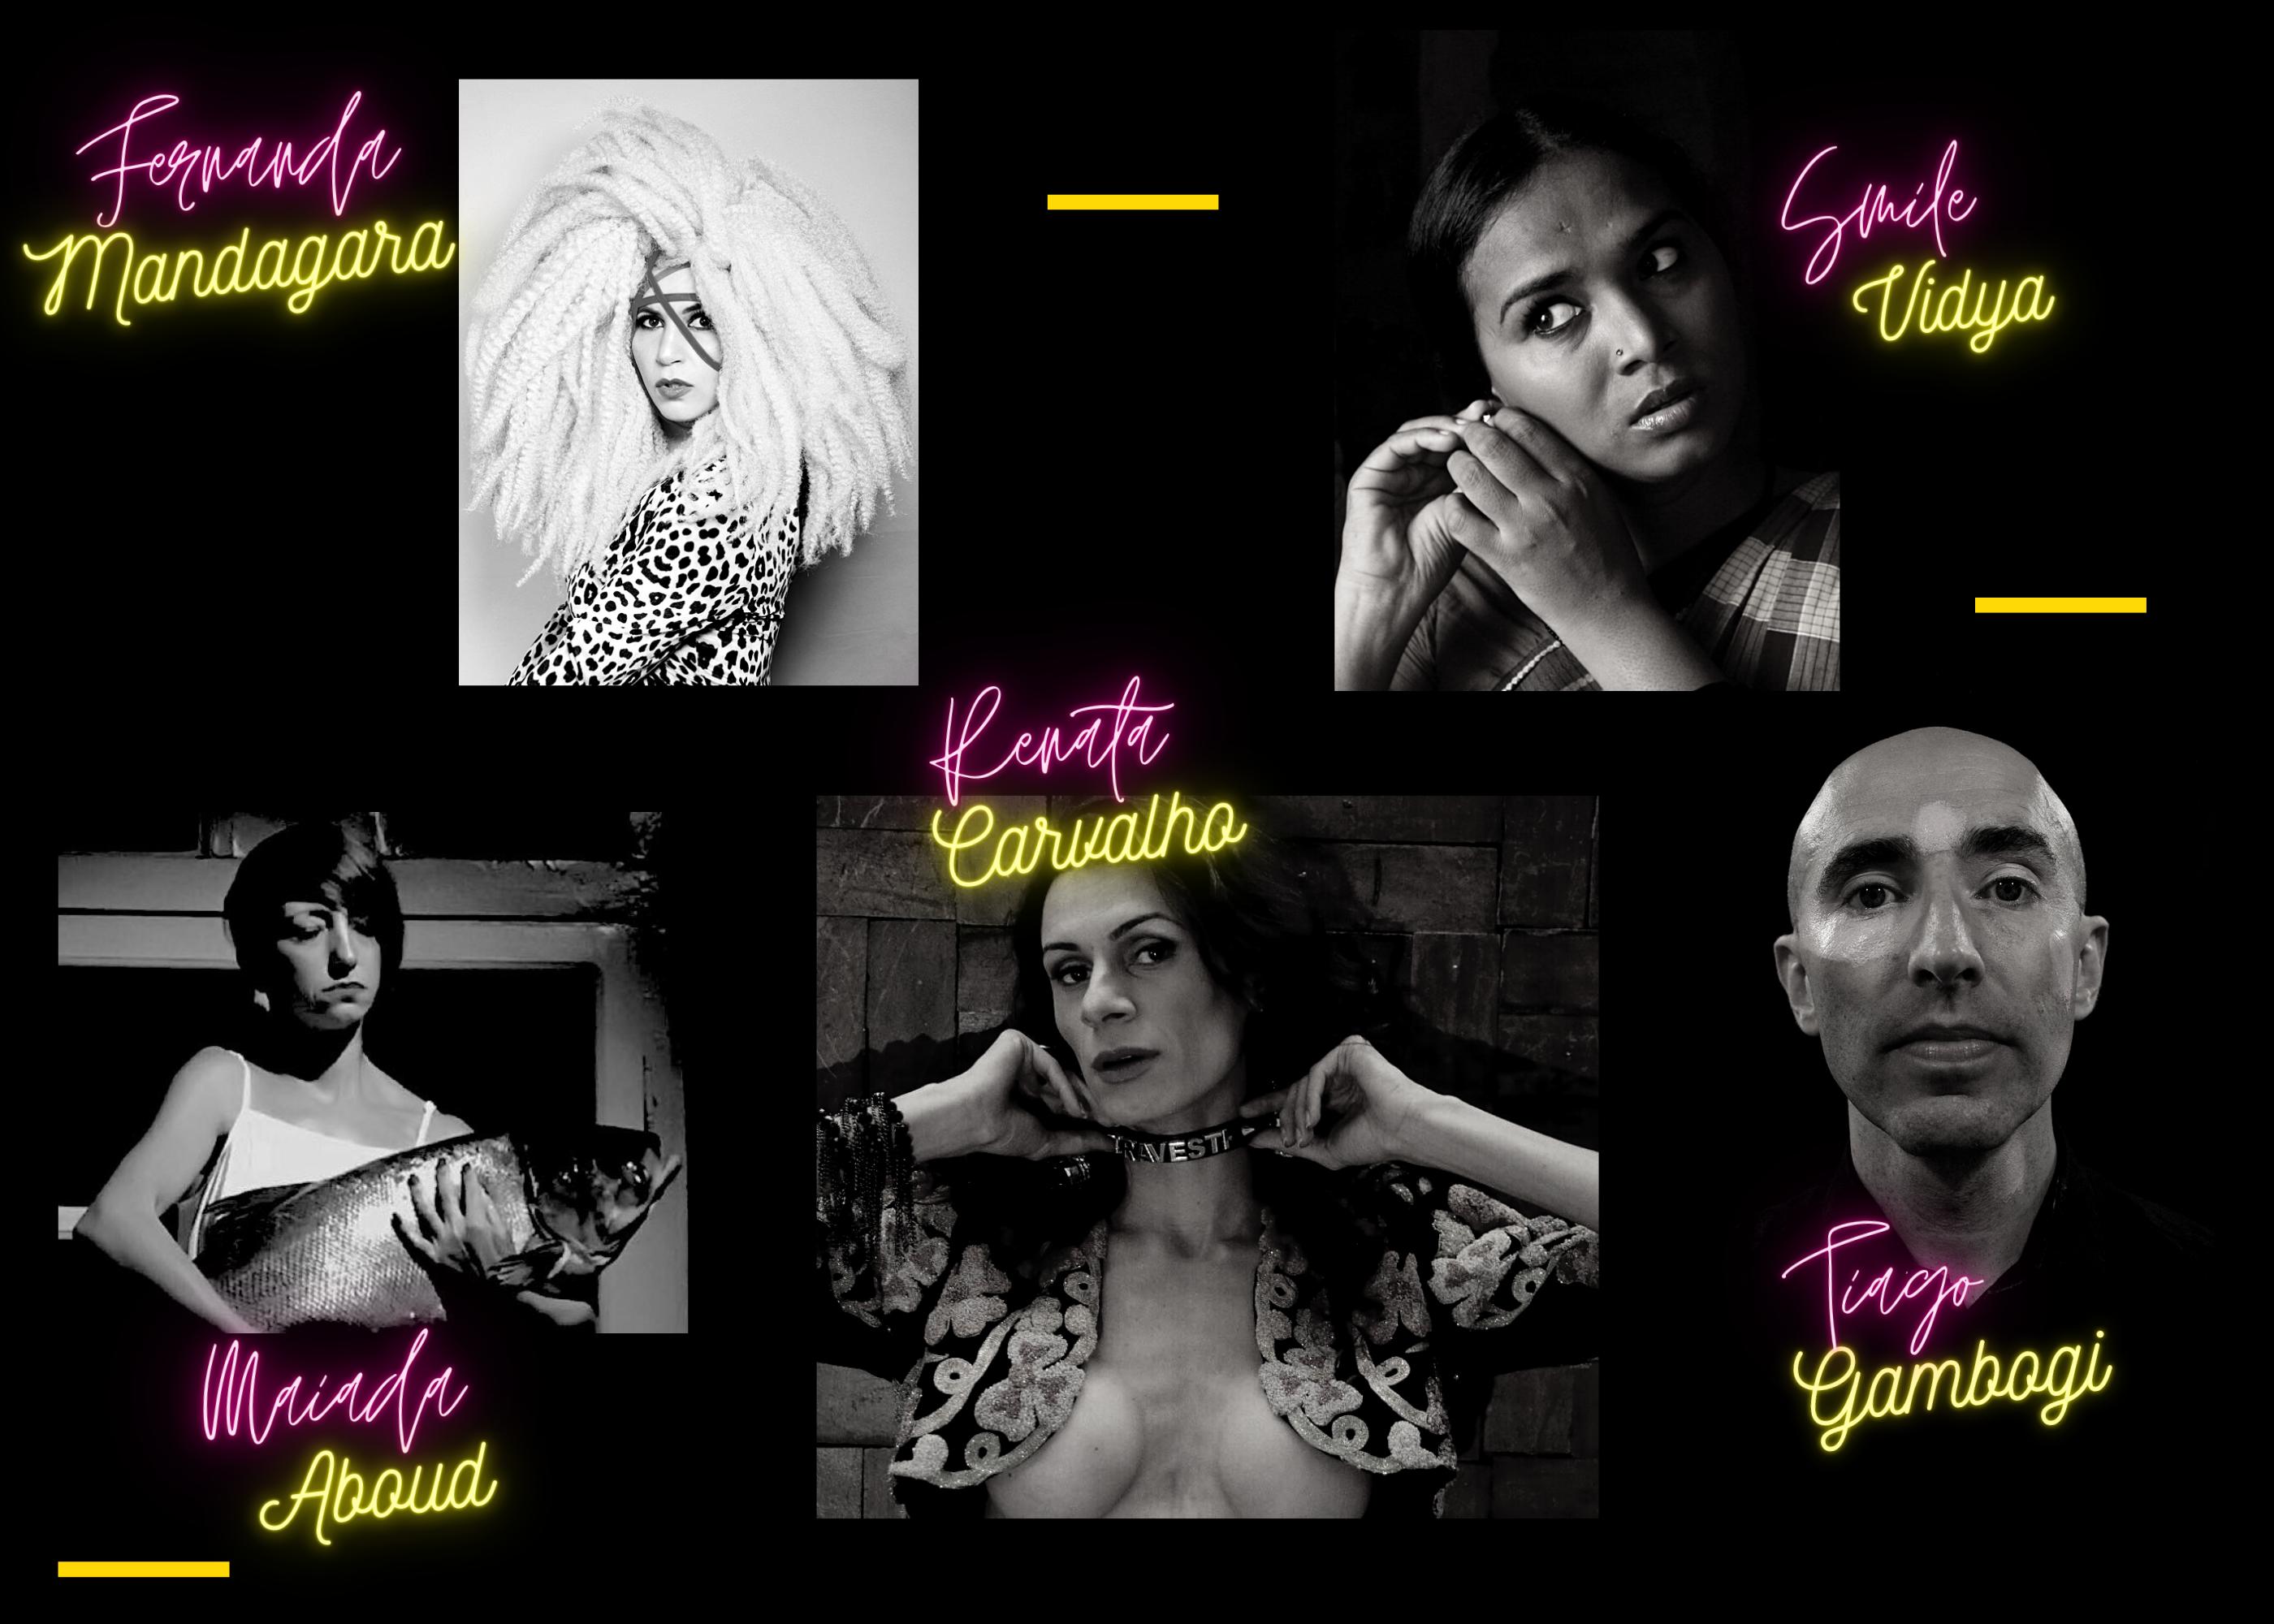 Renata Carvalho - Smile Vidya - Tiago Gambogi - Fernanda Mandagara - Maiada Aboud